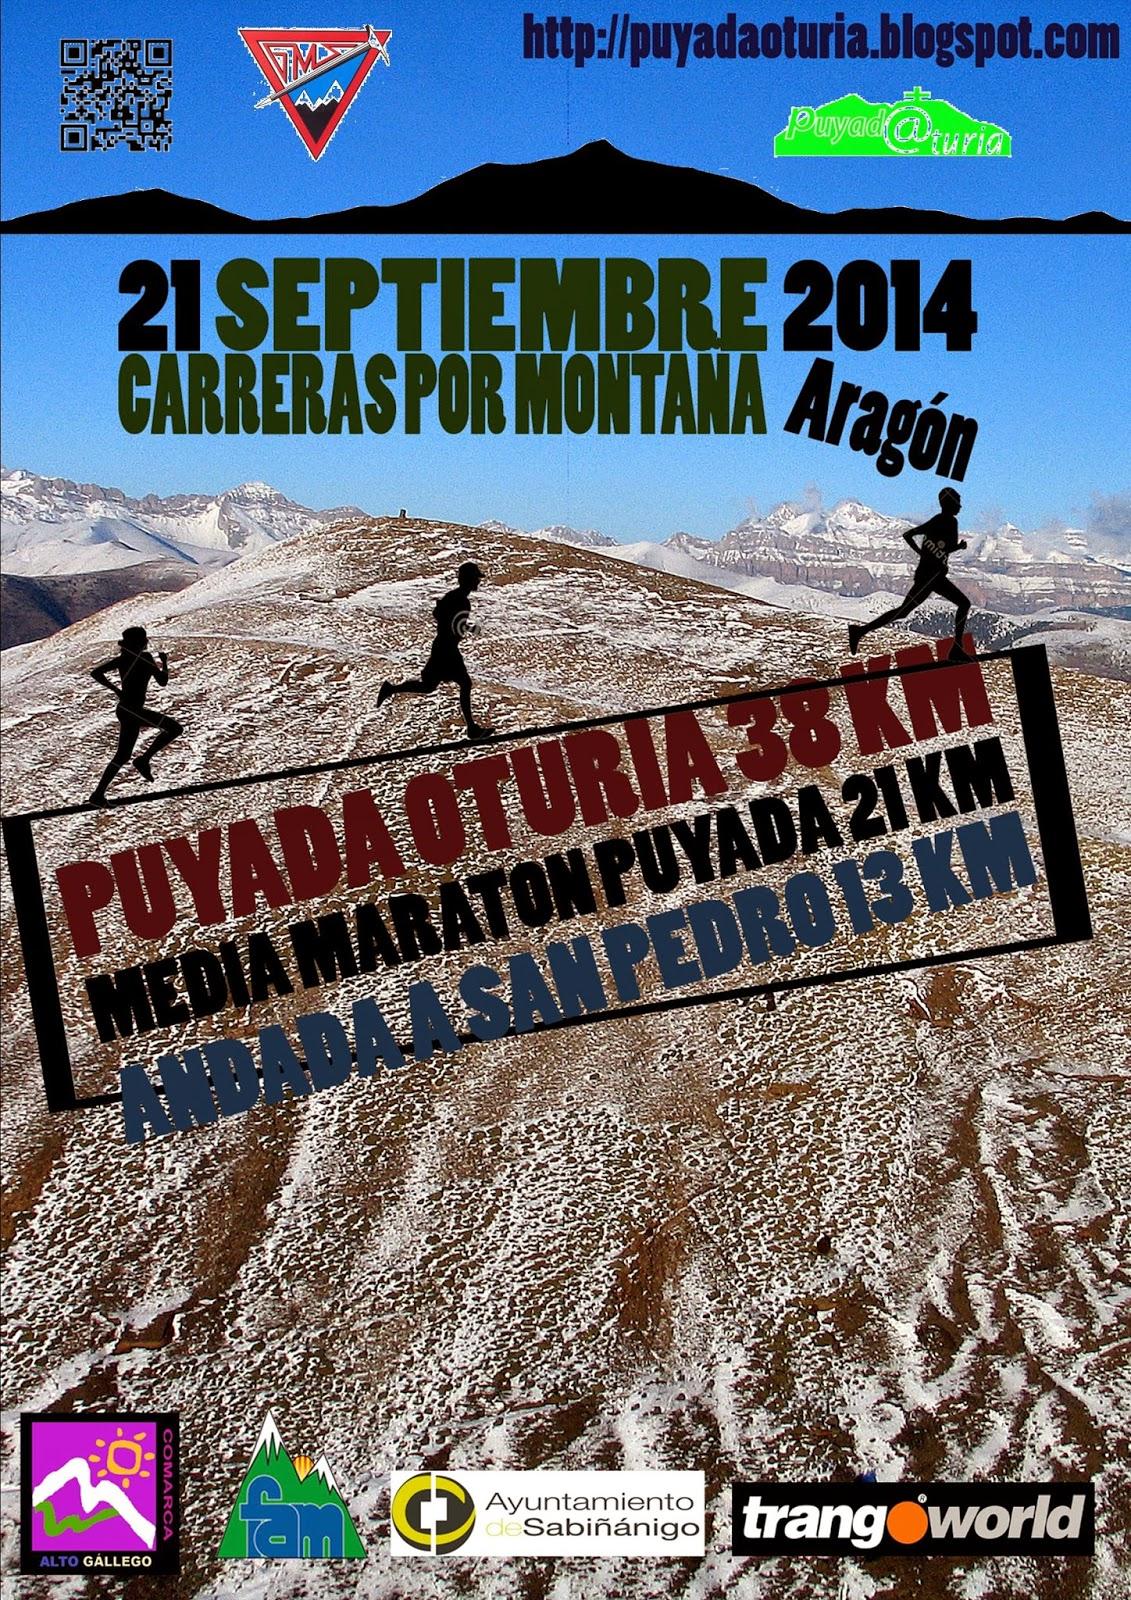 http://puyadaoturia.blogspot.com.es/